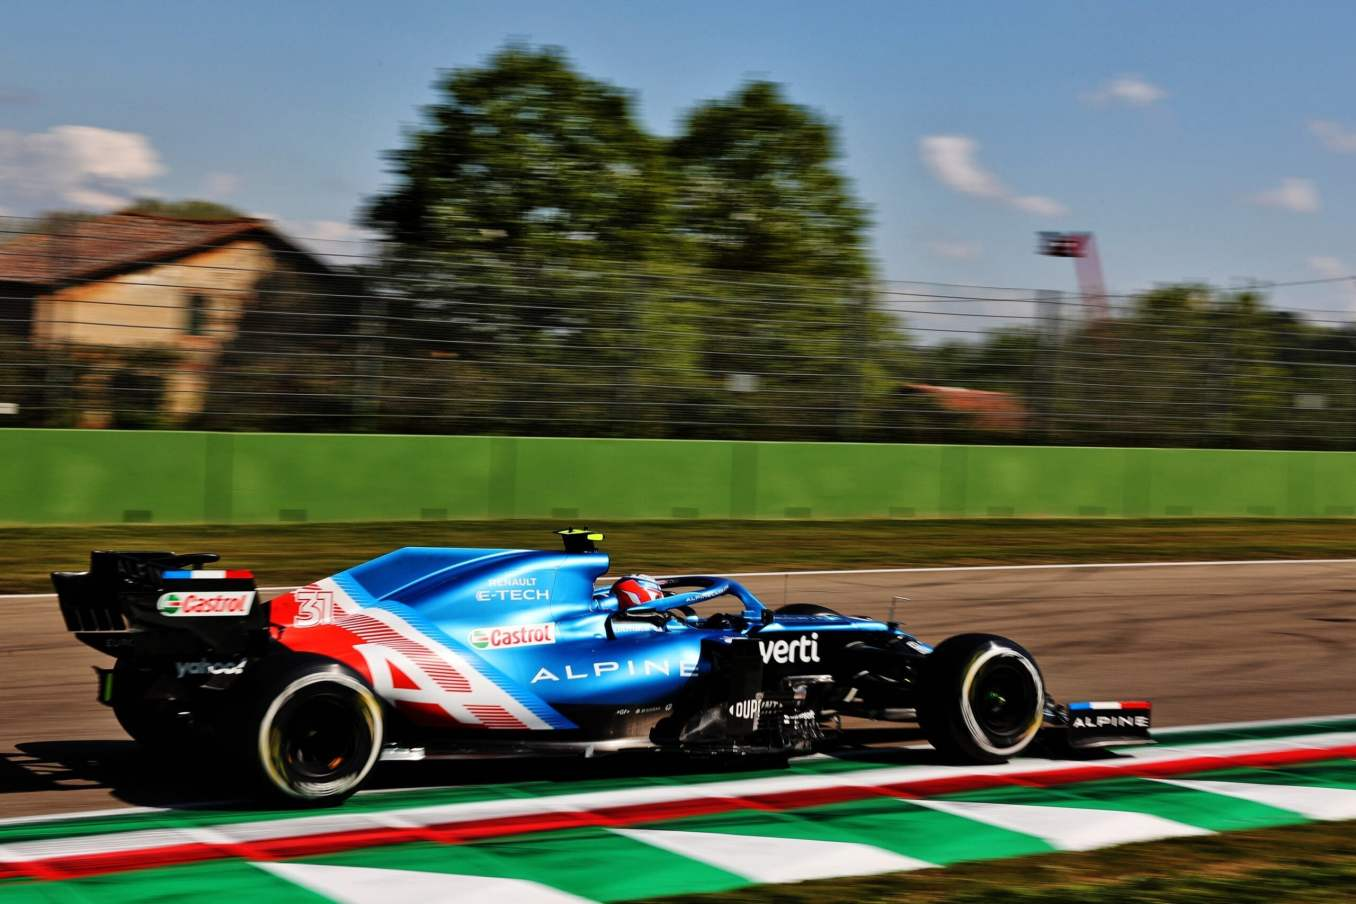 Alpine F1 Team A521 Alonso Ocon Brivio Permane Imola 2021 Test 26 scaled | Alpine F1 Team en milieu de peloton aux essais à Imola